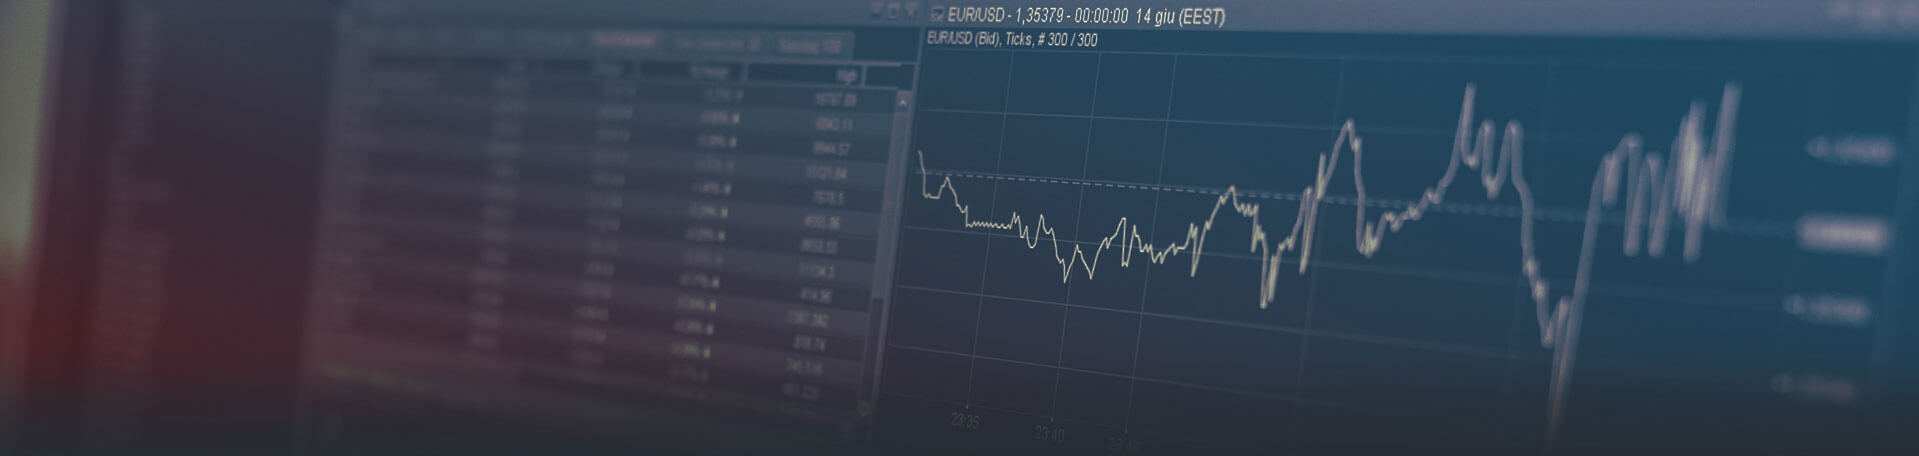 Graphique trading